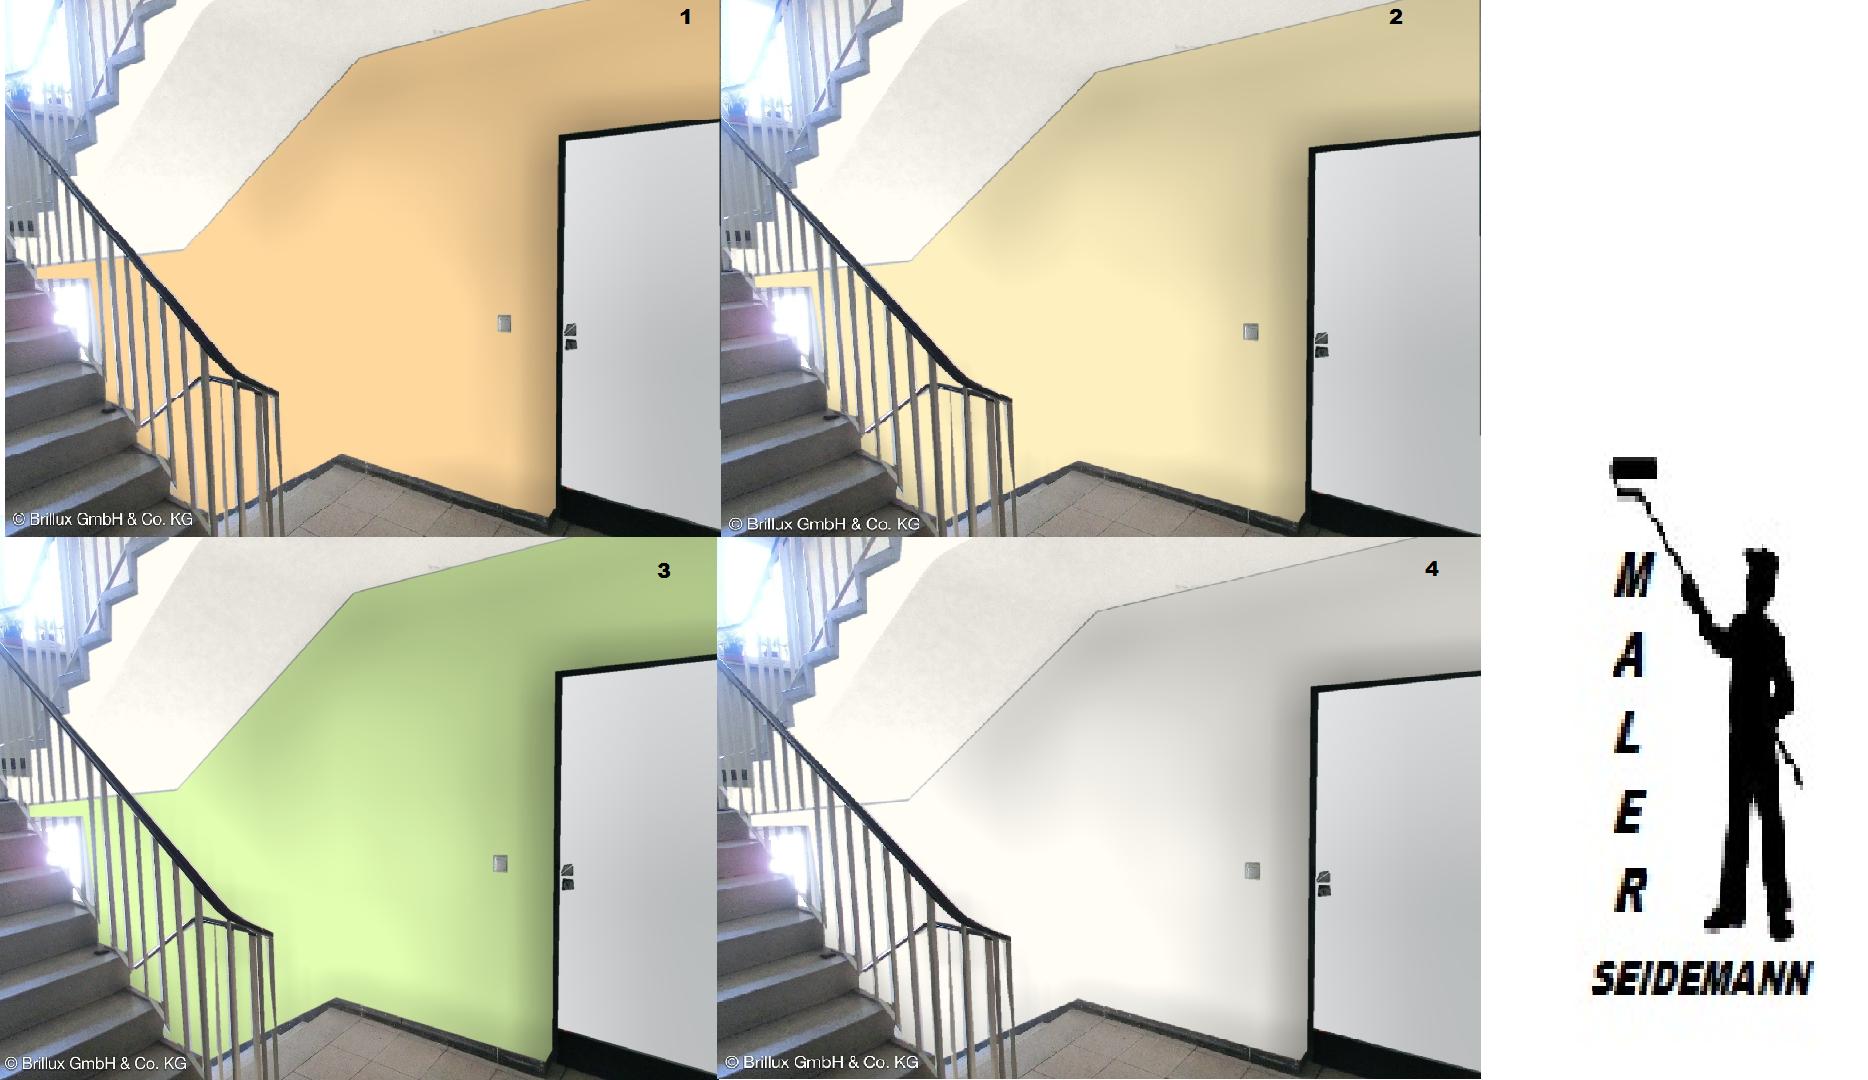 Farbmuster mit dem Farbdesigner/Treppenhaus